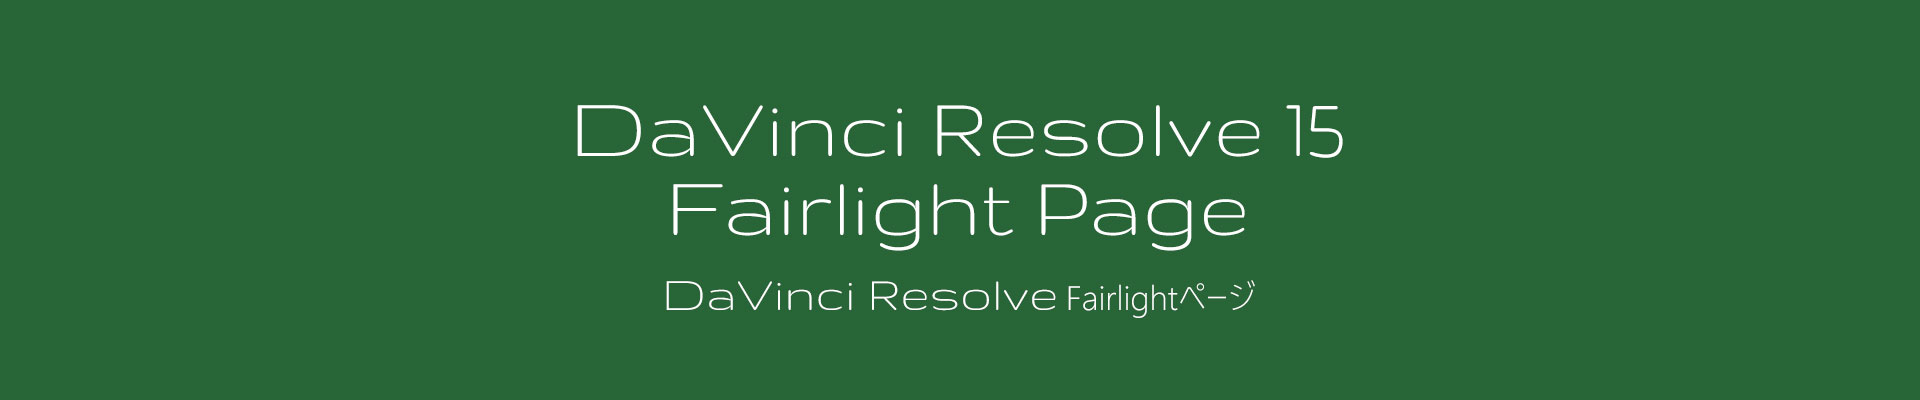 DaVinciResolve15 Fairlight Page